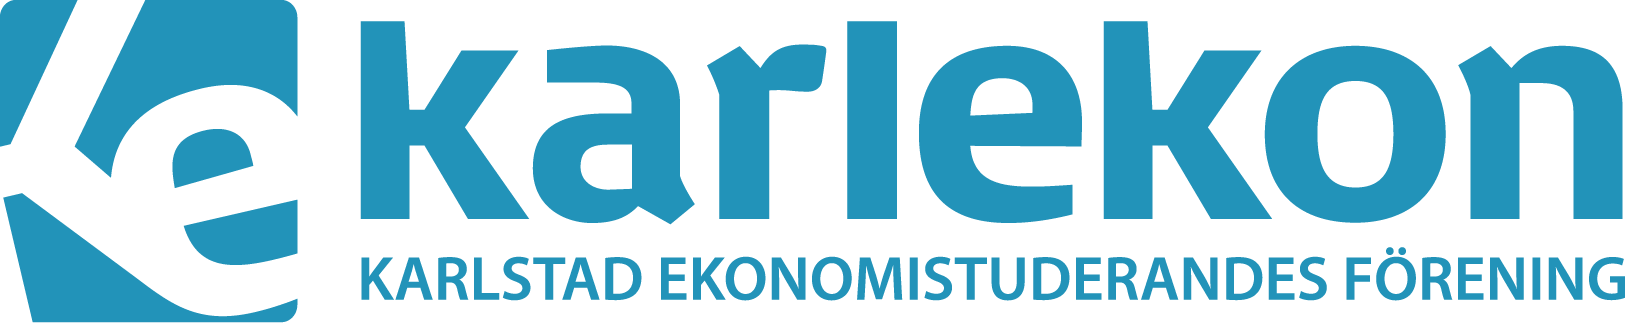 Karlekon